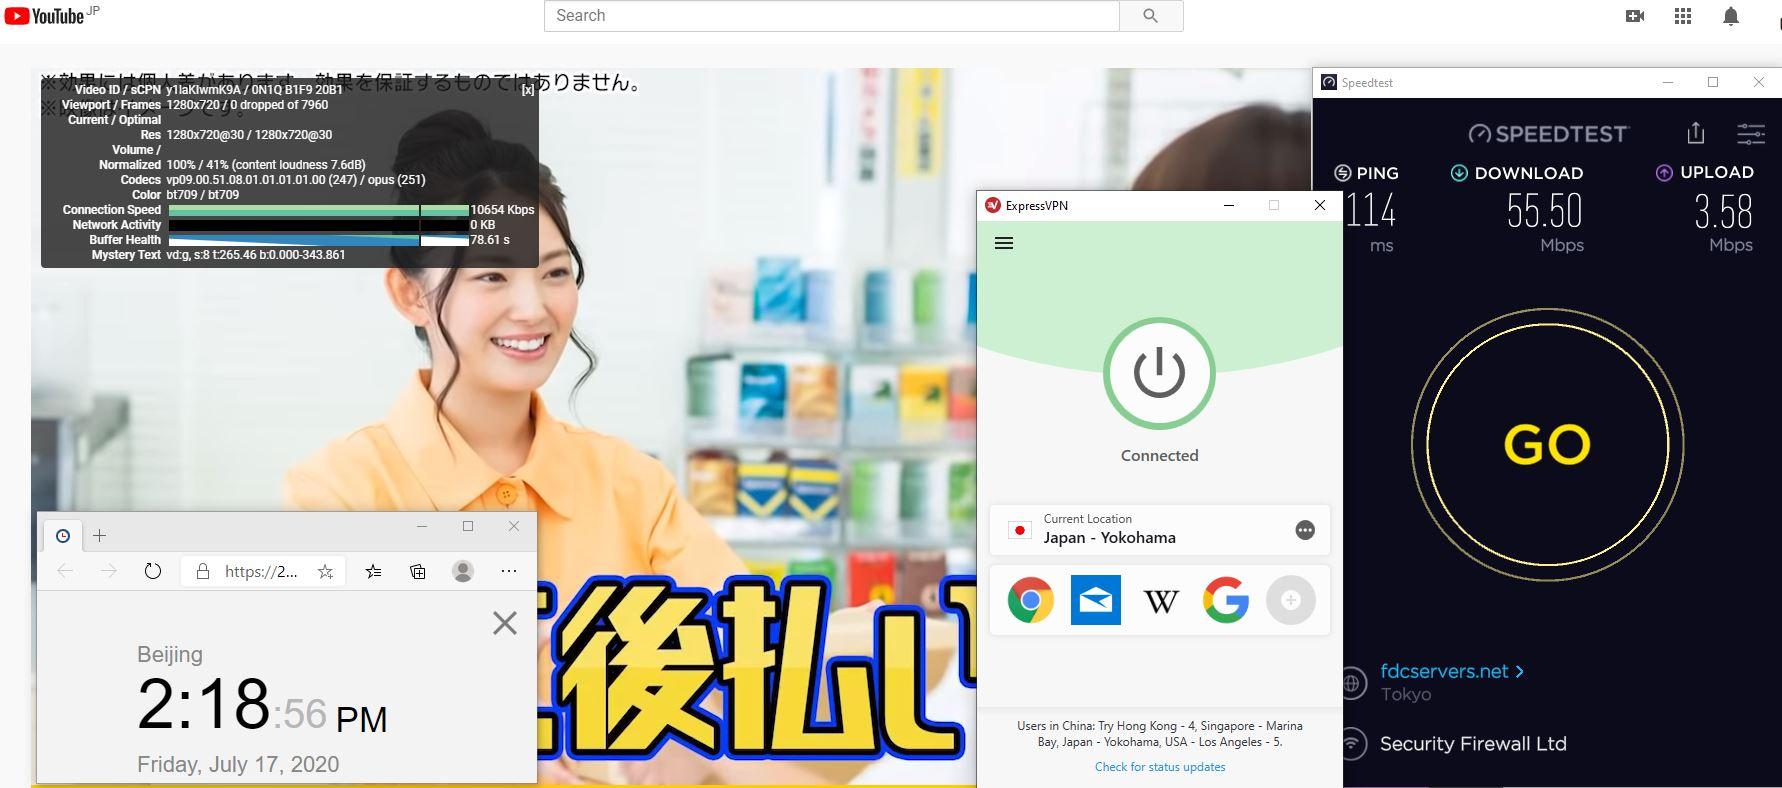 Windows10 ExpressVPN Auto Japan - Yokohama 中国VPN 翻墙 科学上网 测速-20200717